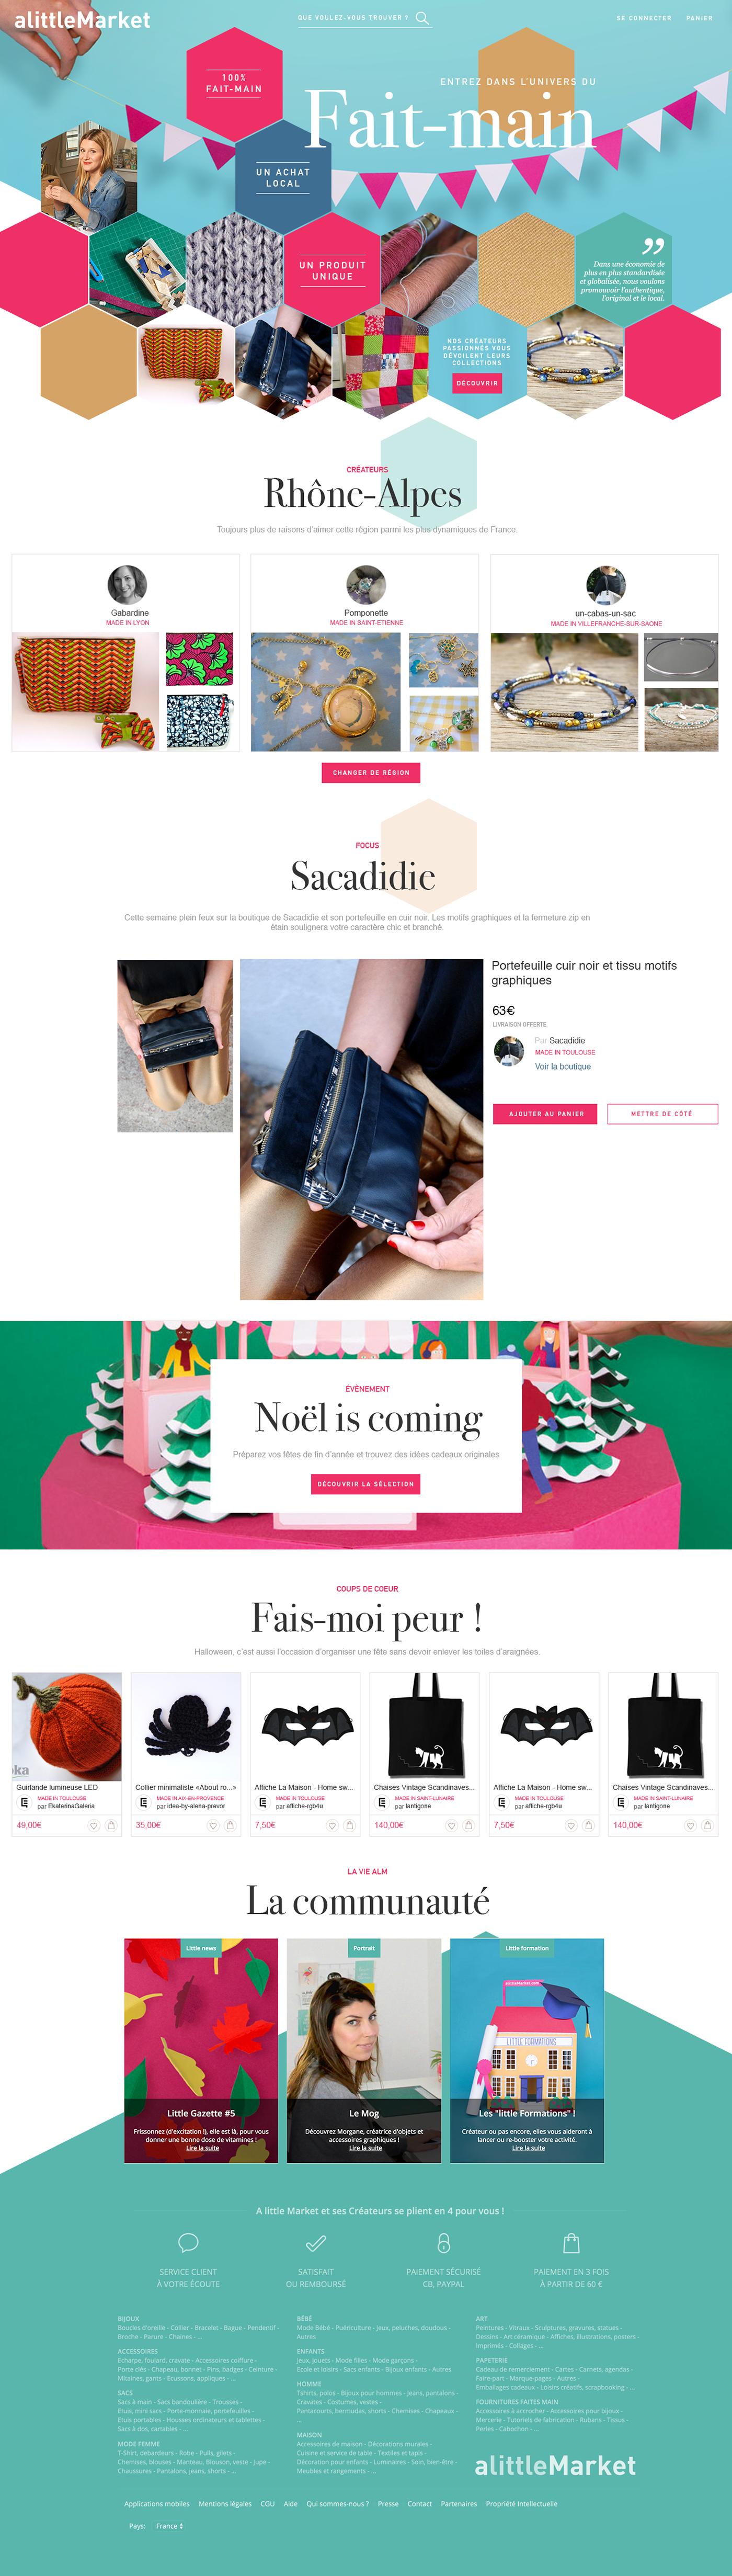 redesign Marketplace Ecommerce visual design Webdesign product design  UI